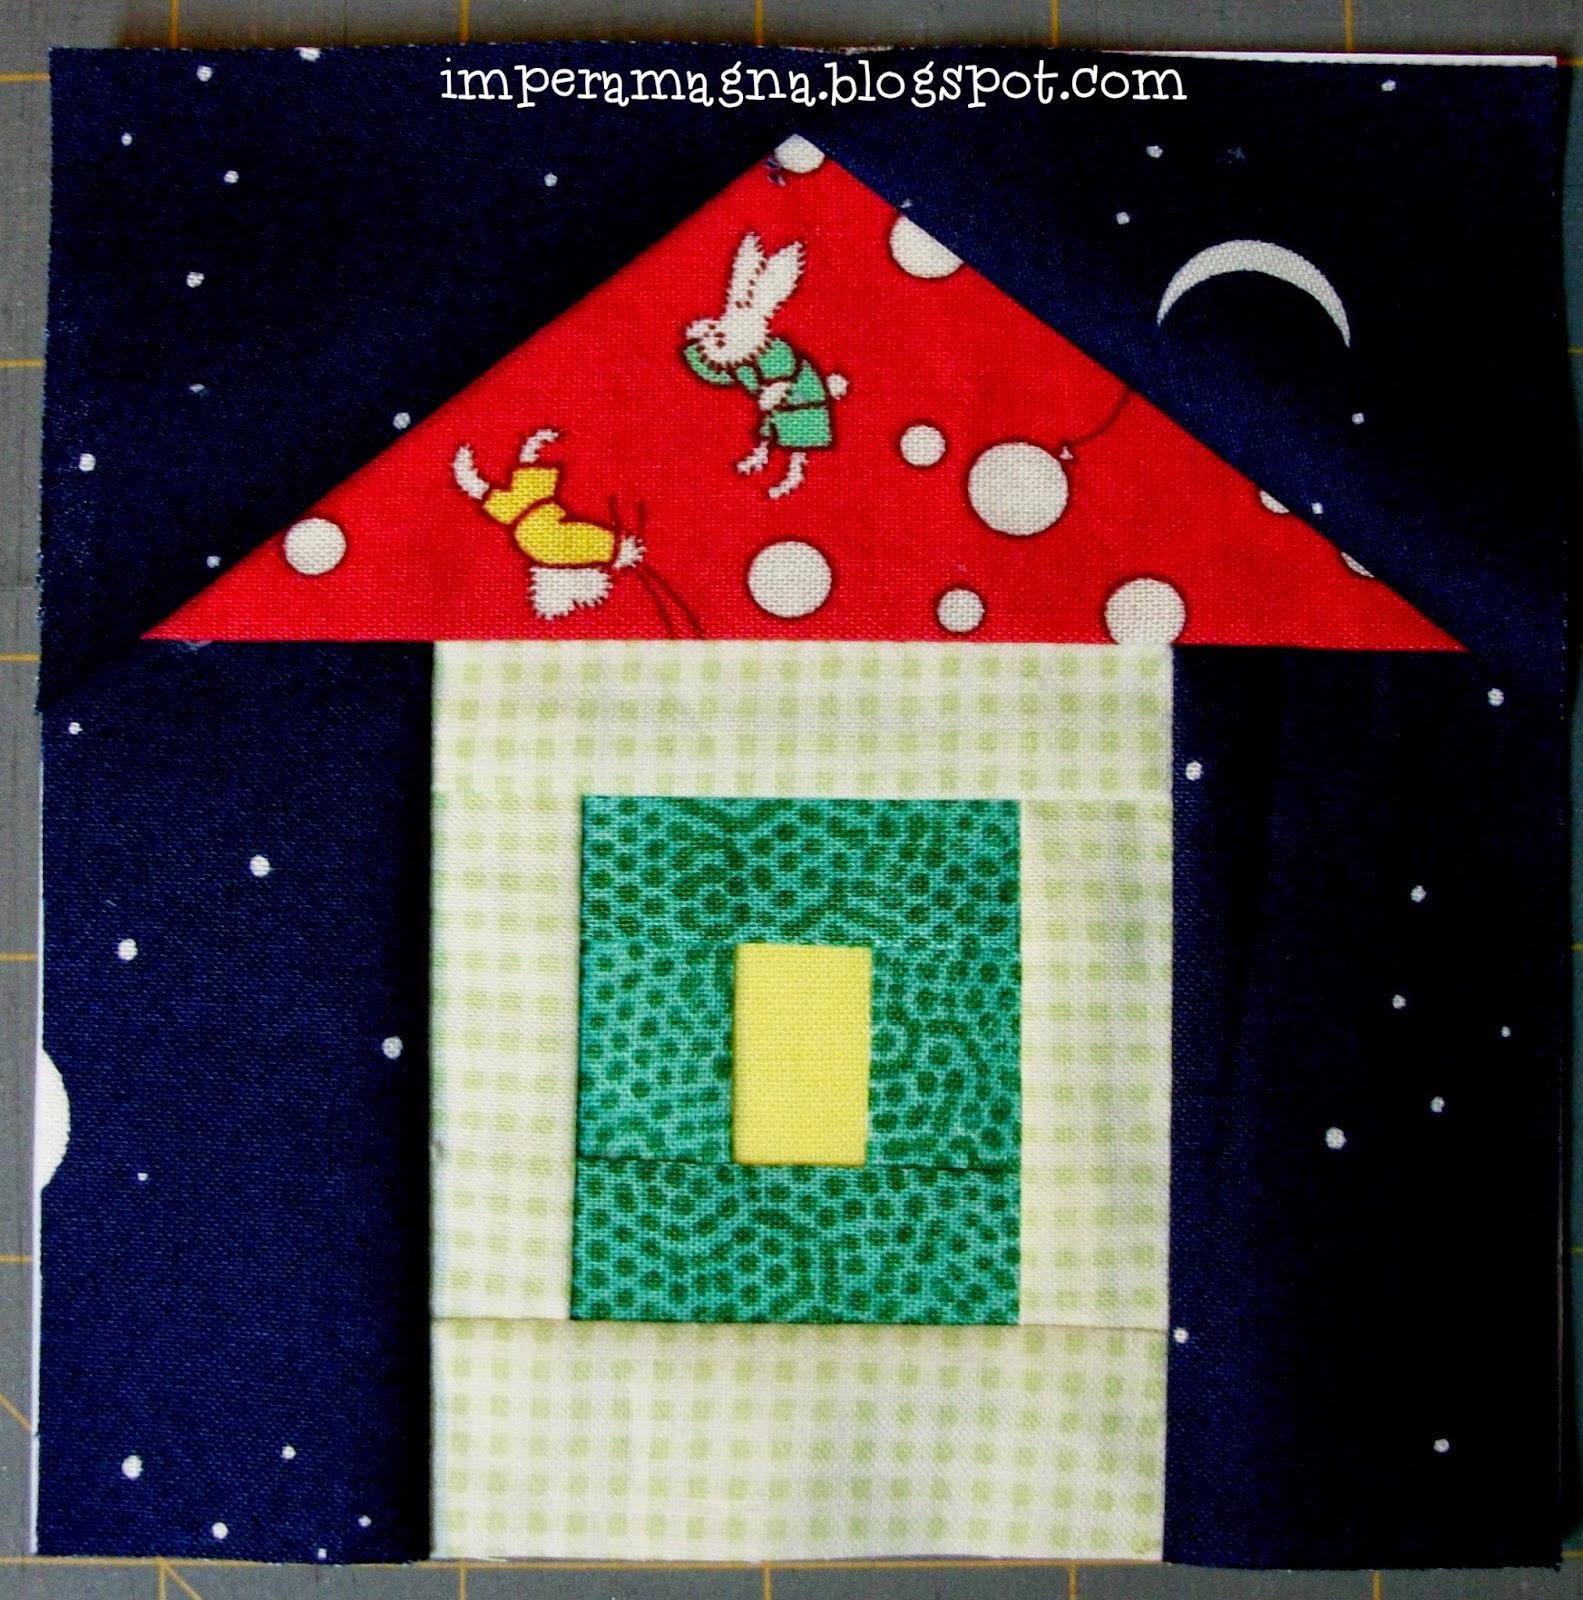 http://1.bp.blogspot.com/-VpxFd0KnLvo/U81IMqUaU6I/AAAAAAAAKNA/8TmVB-qdvkg/s1600/tiny+house+%2314.jpg